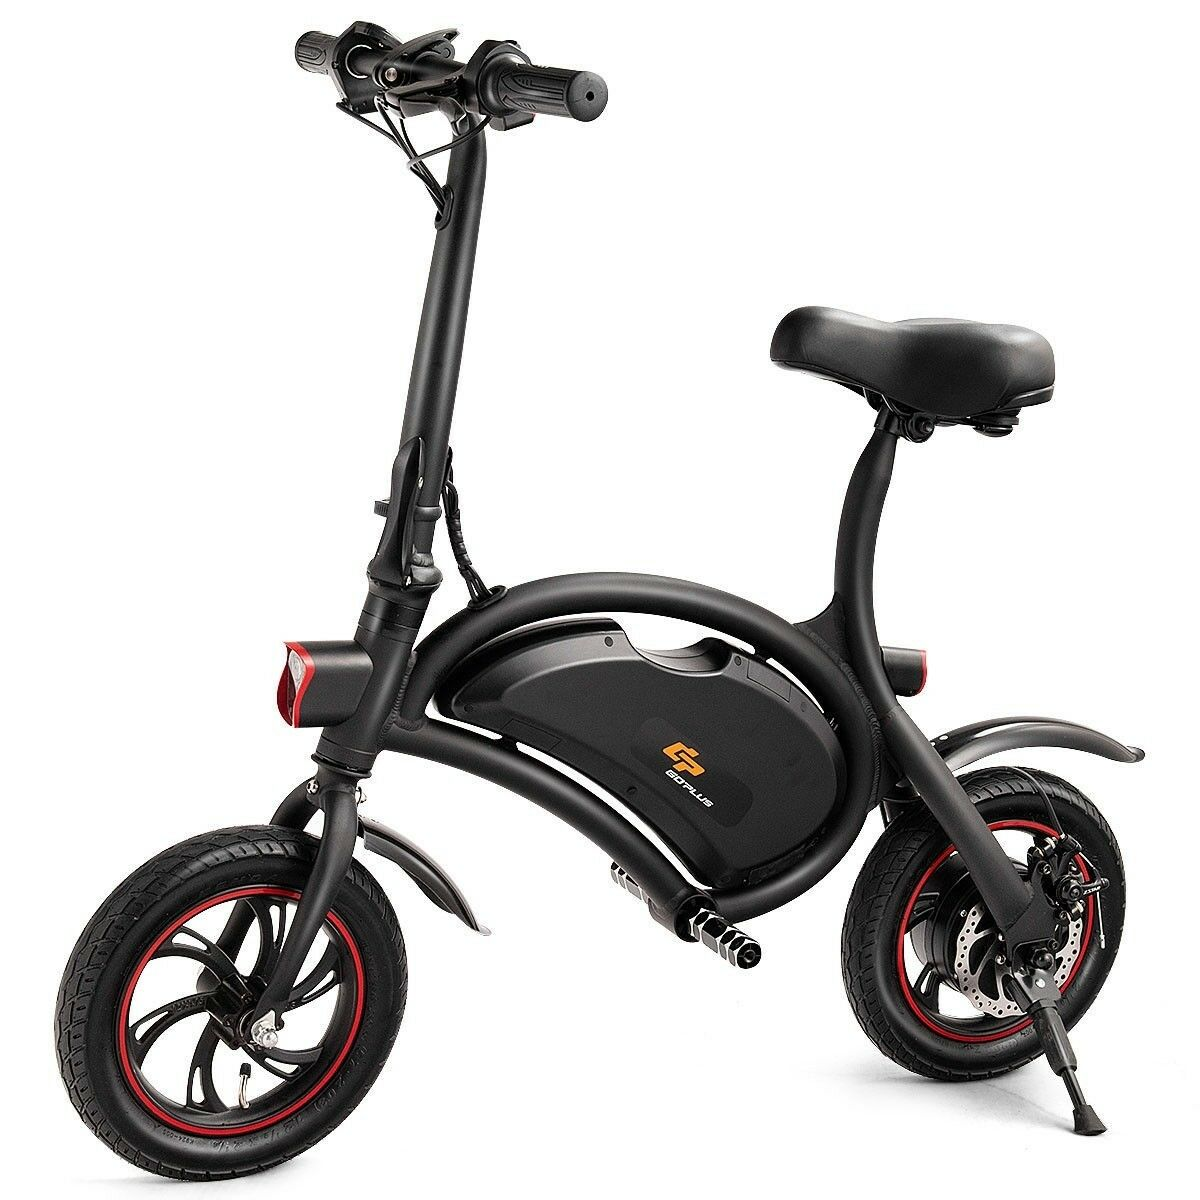 12  350W Portable Folding Electric Bicycle Bike EBike Cruise Control W Headlight